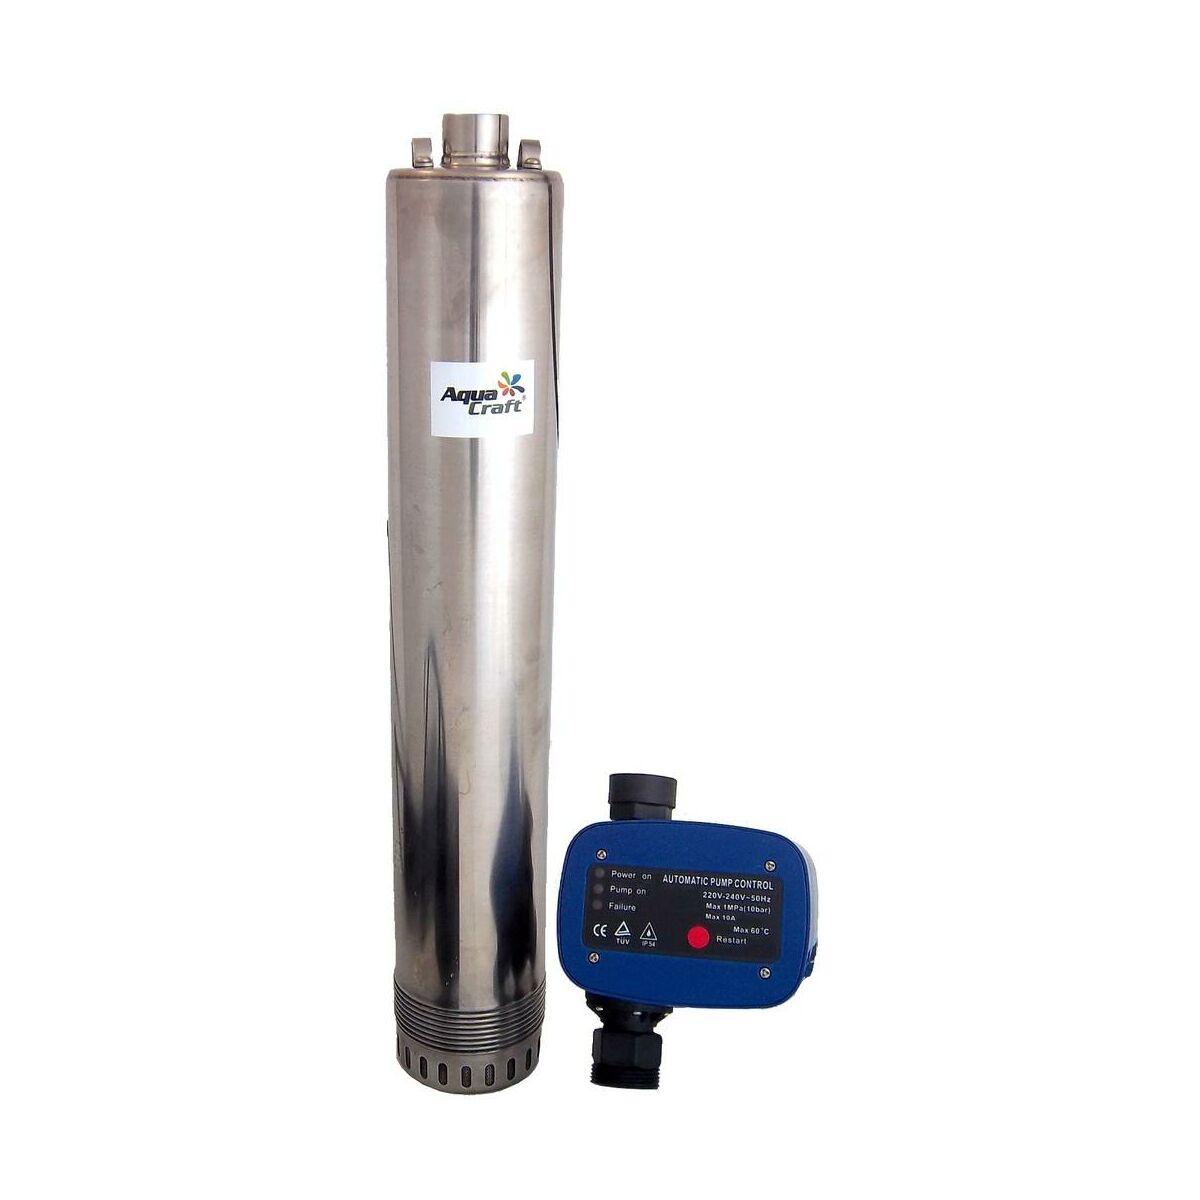 Pompa g binowa msp1000x8am02t presscontroll aquacraft for Pompa sommersa leroy merlin